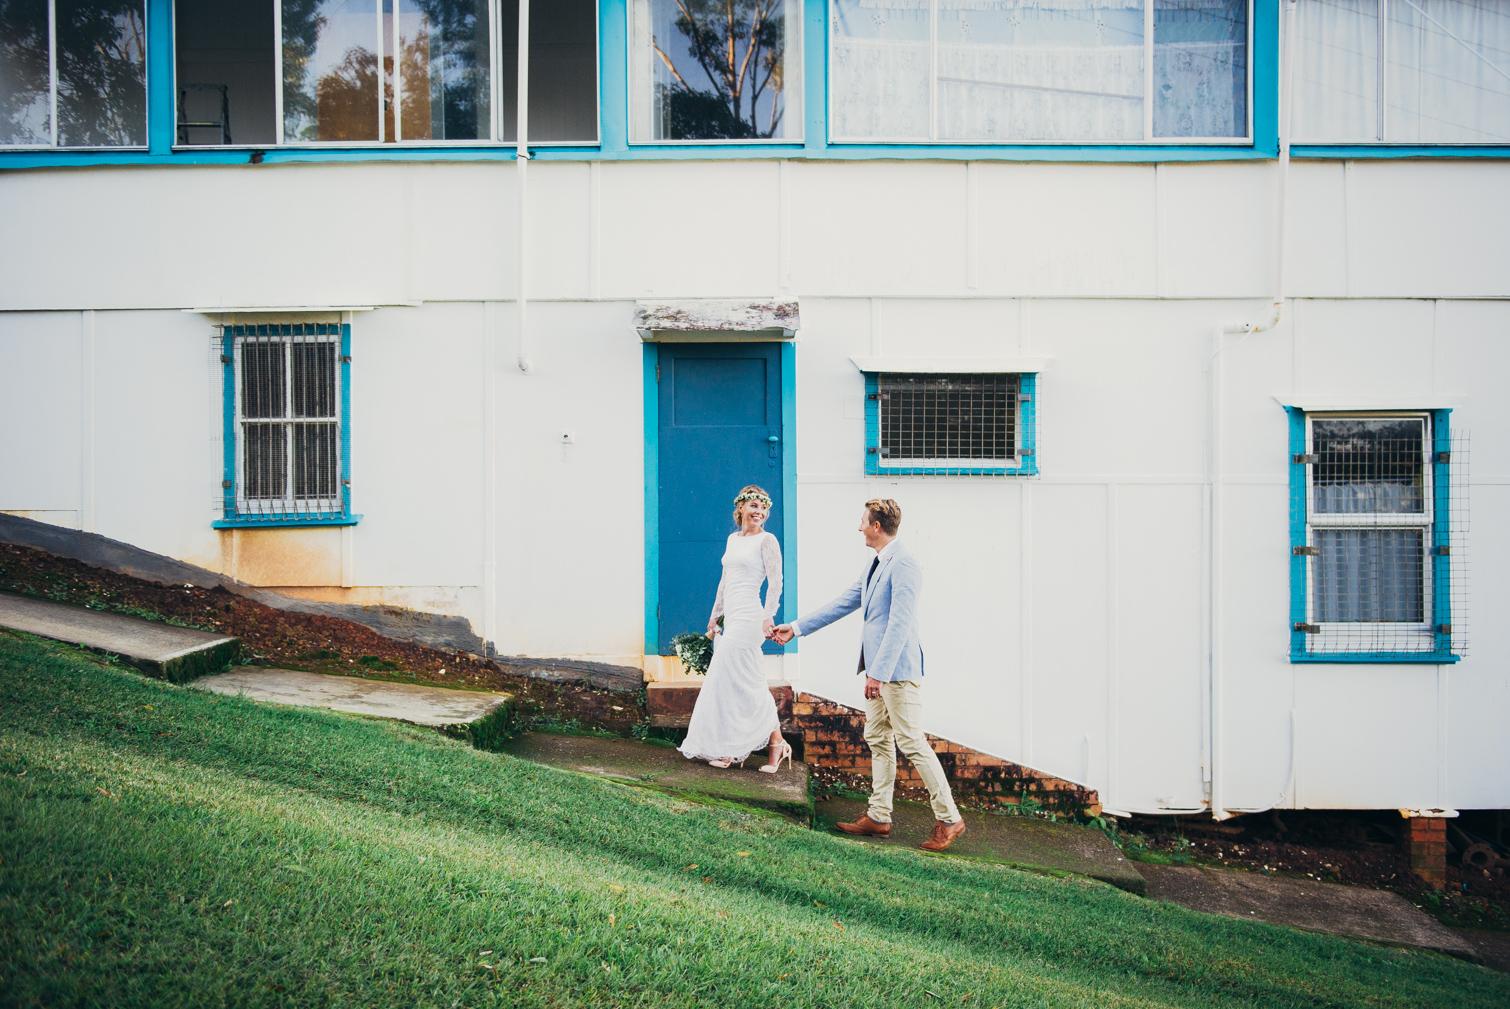 Kirra_Hill-Community_Centre_Wedding_Venue-16.jpg